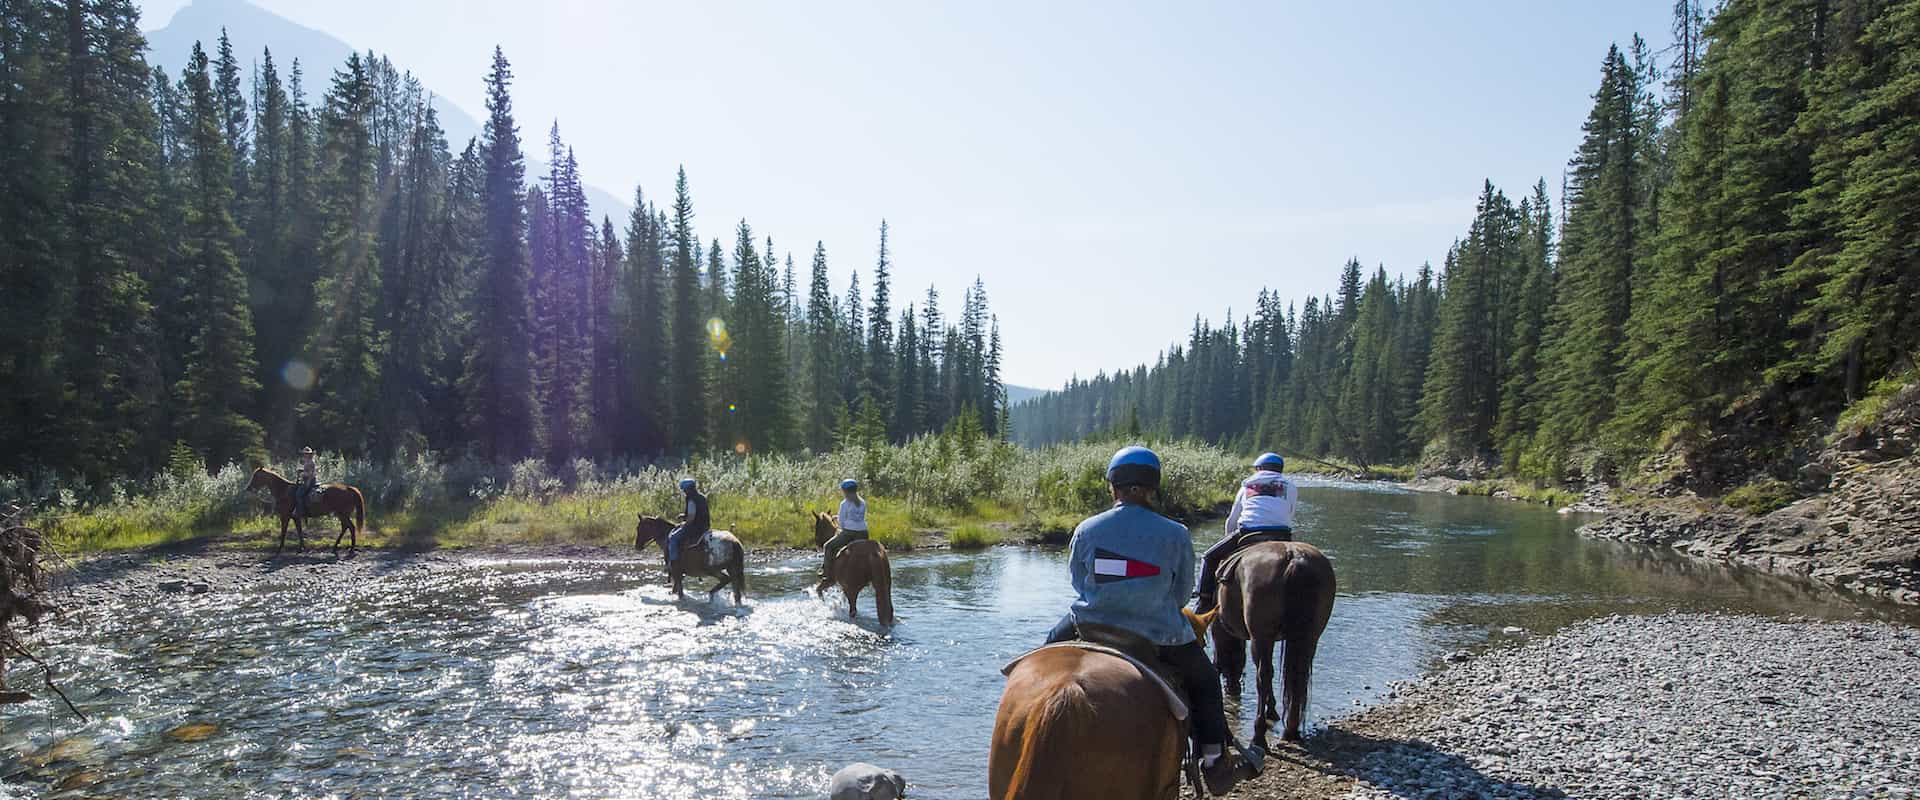 Horseback Ride – Spray River 1 Hr